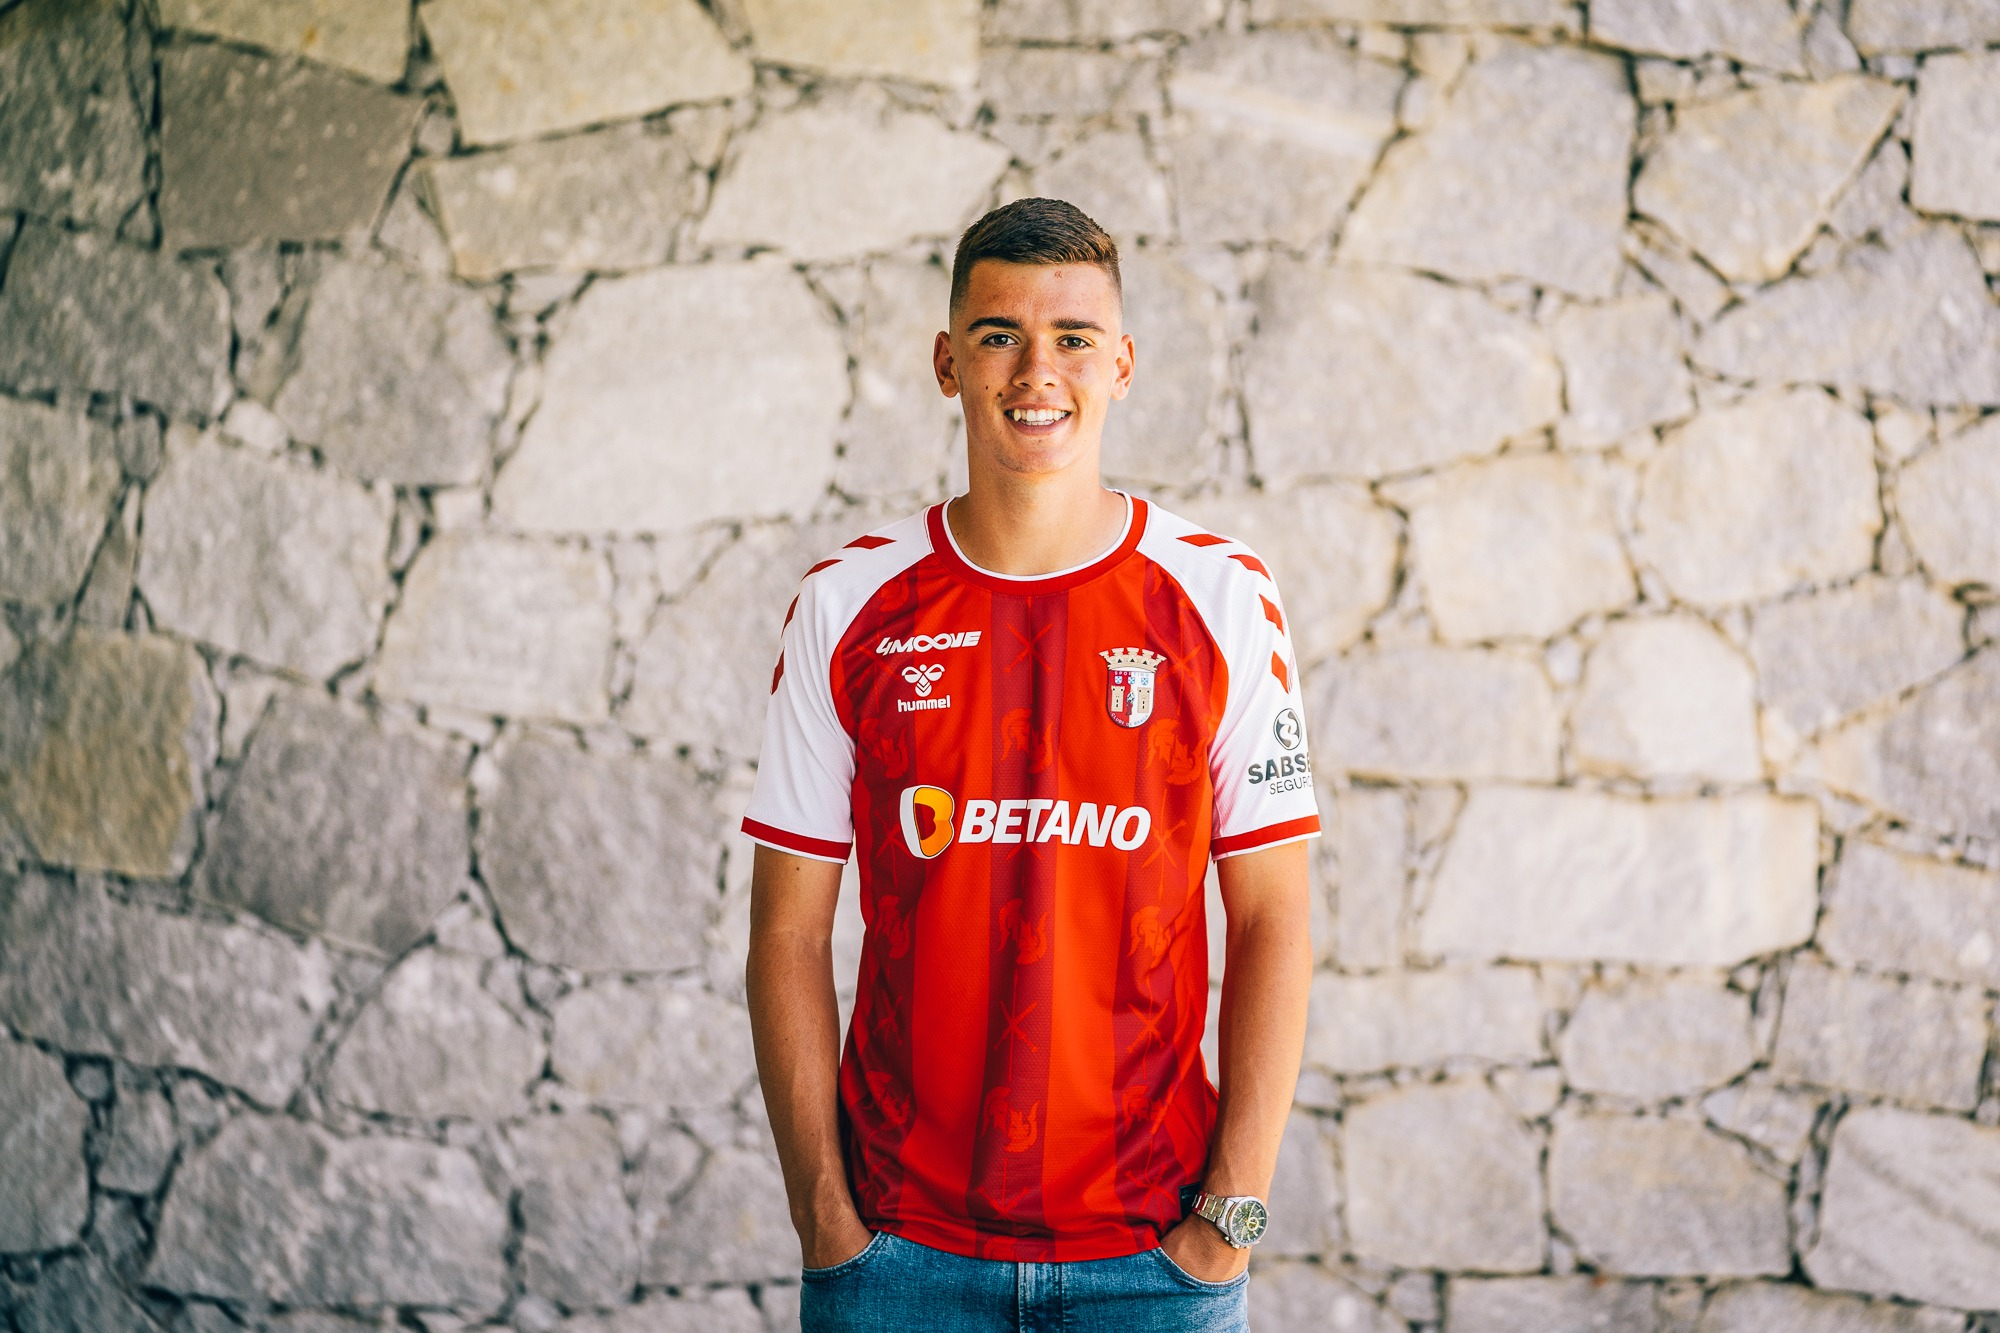 Nuno Matos assina contrato profissional